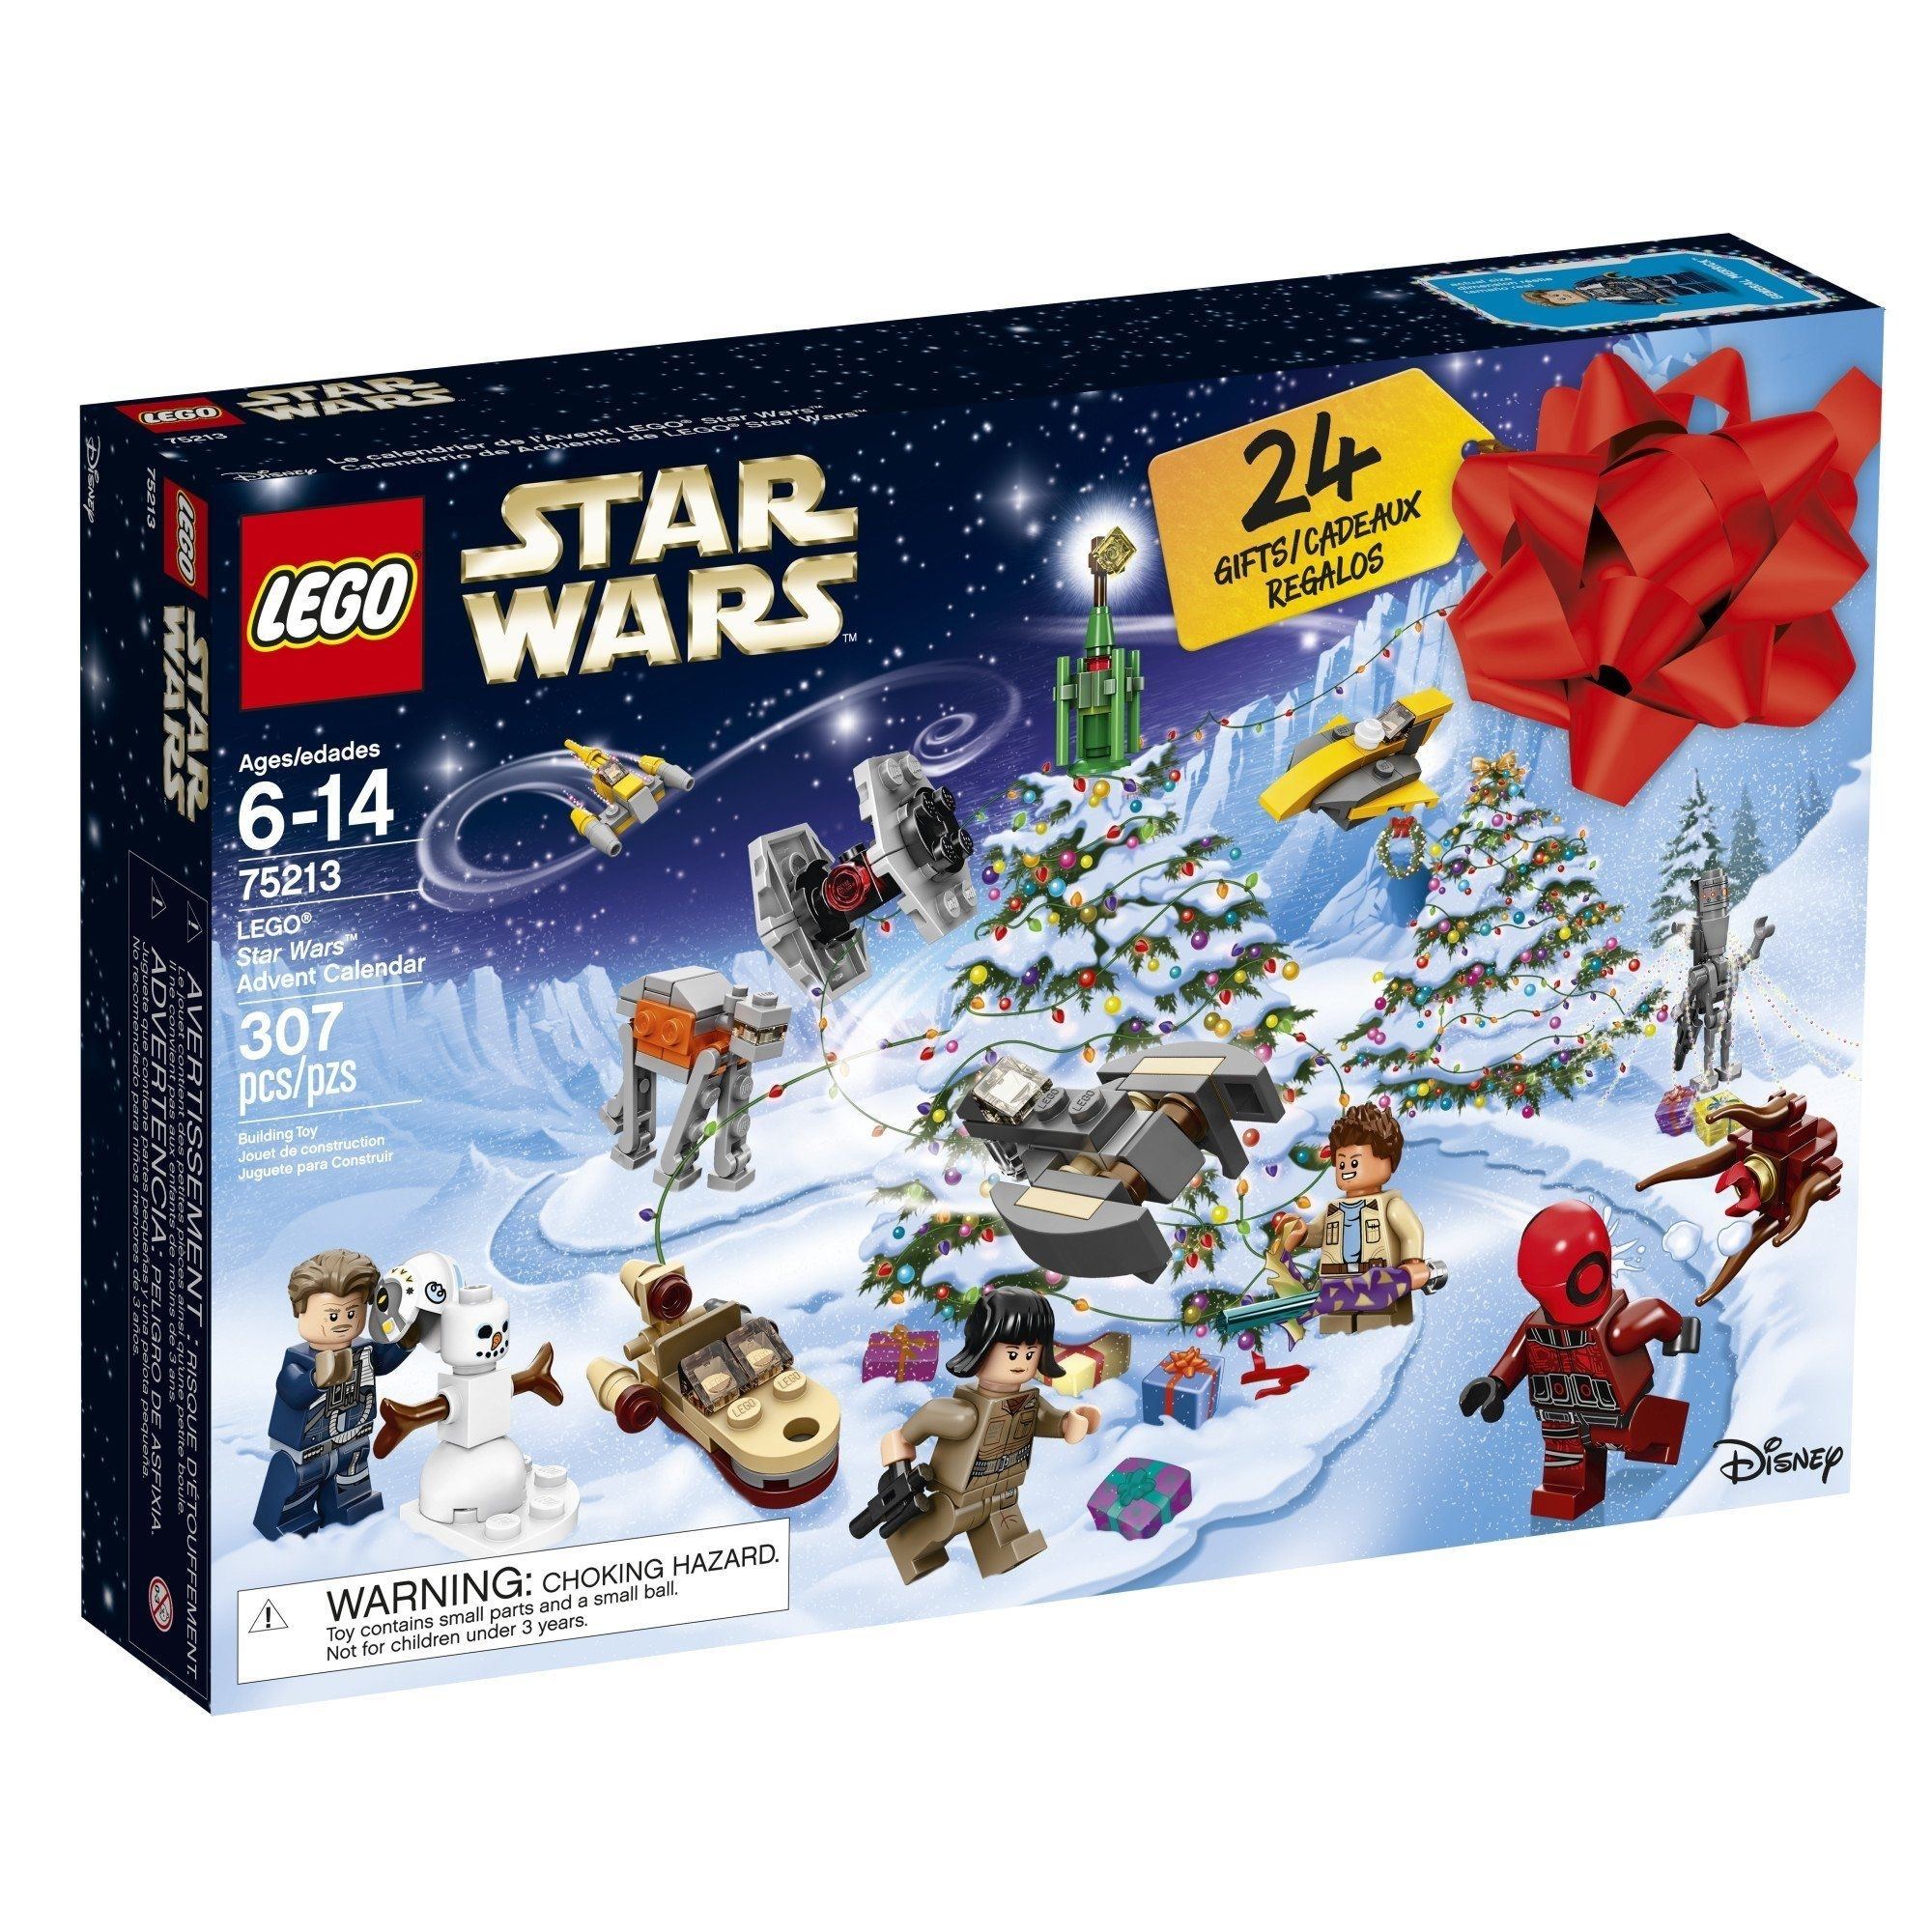 Take Lego 6213564 Star Wars Tm Advent Calendar 75213 2018 Edition Minifigures Small Building Toys Christmas Countdown Calendar K